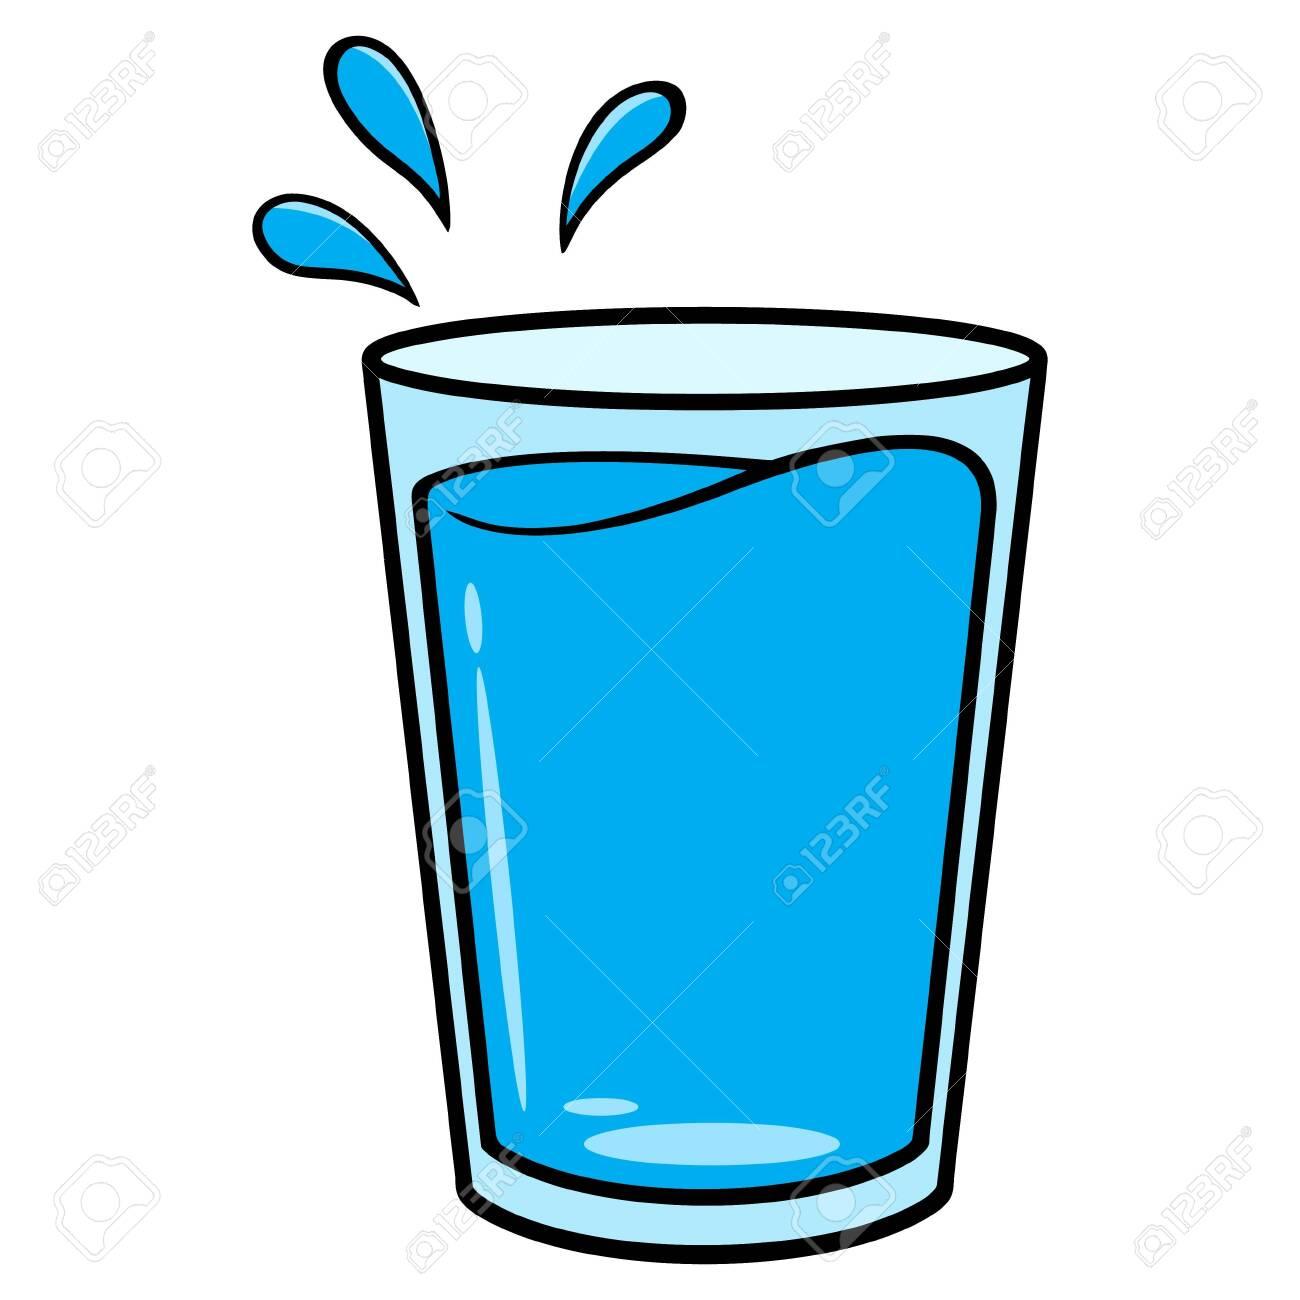 glass of water cartoon a vector cartoon illustration of a glass